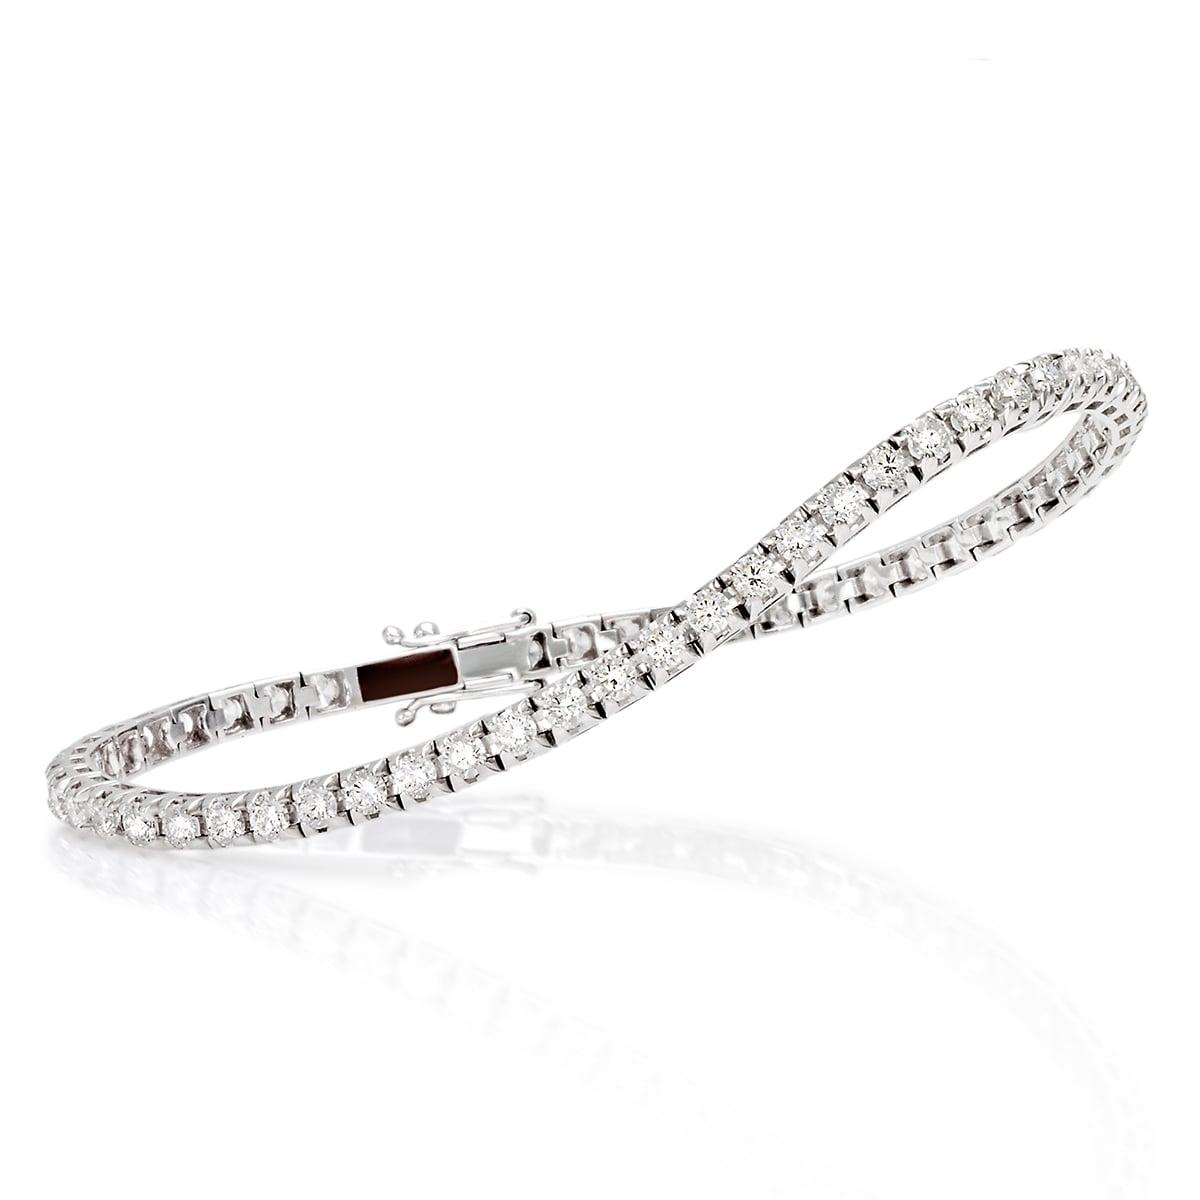 Tennisarmband med diamanter 1.85ct